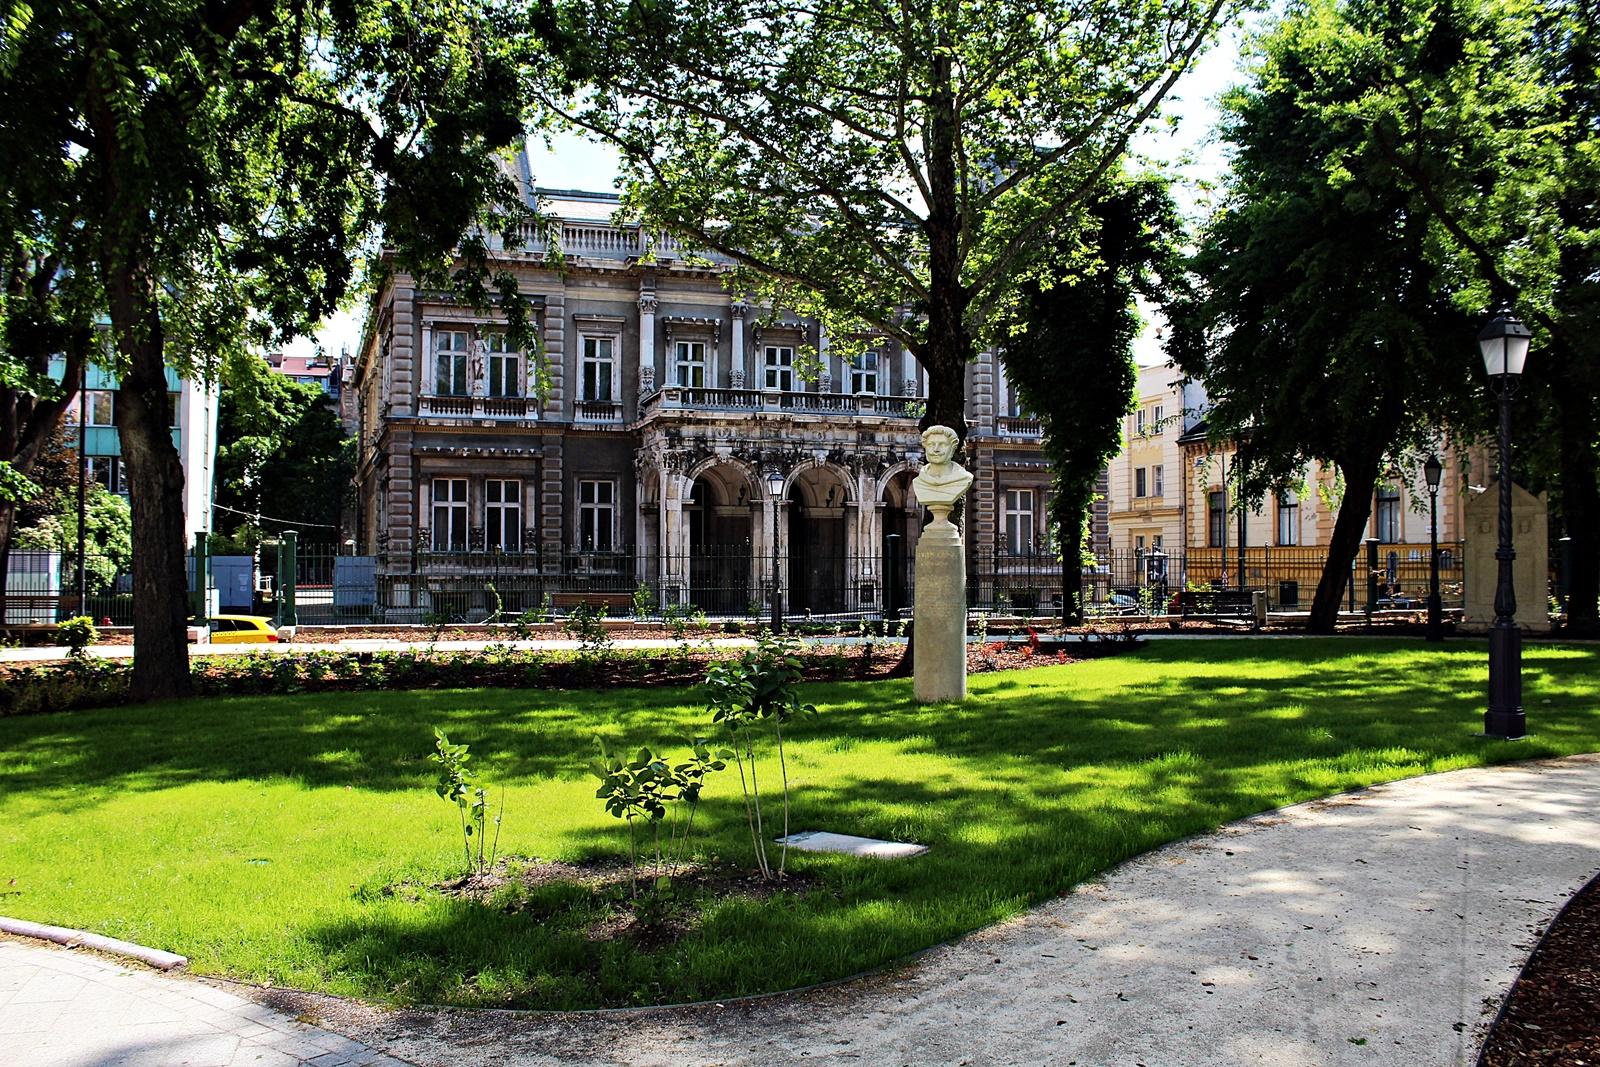 muzeumkert-budapest-nemzeti-muzeum-mysecretbudapest-1.JPG